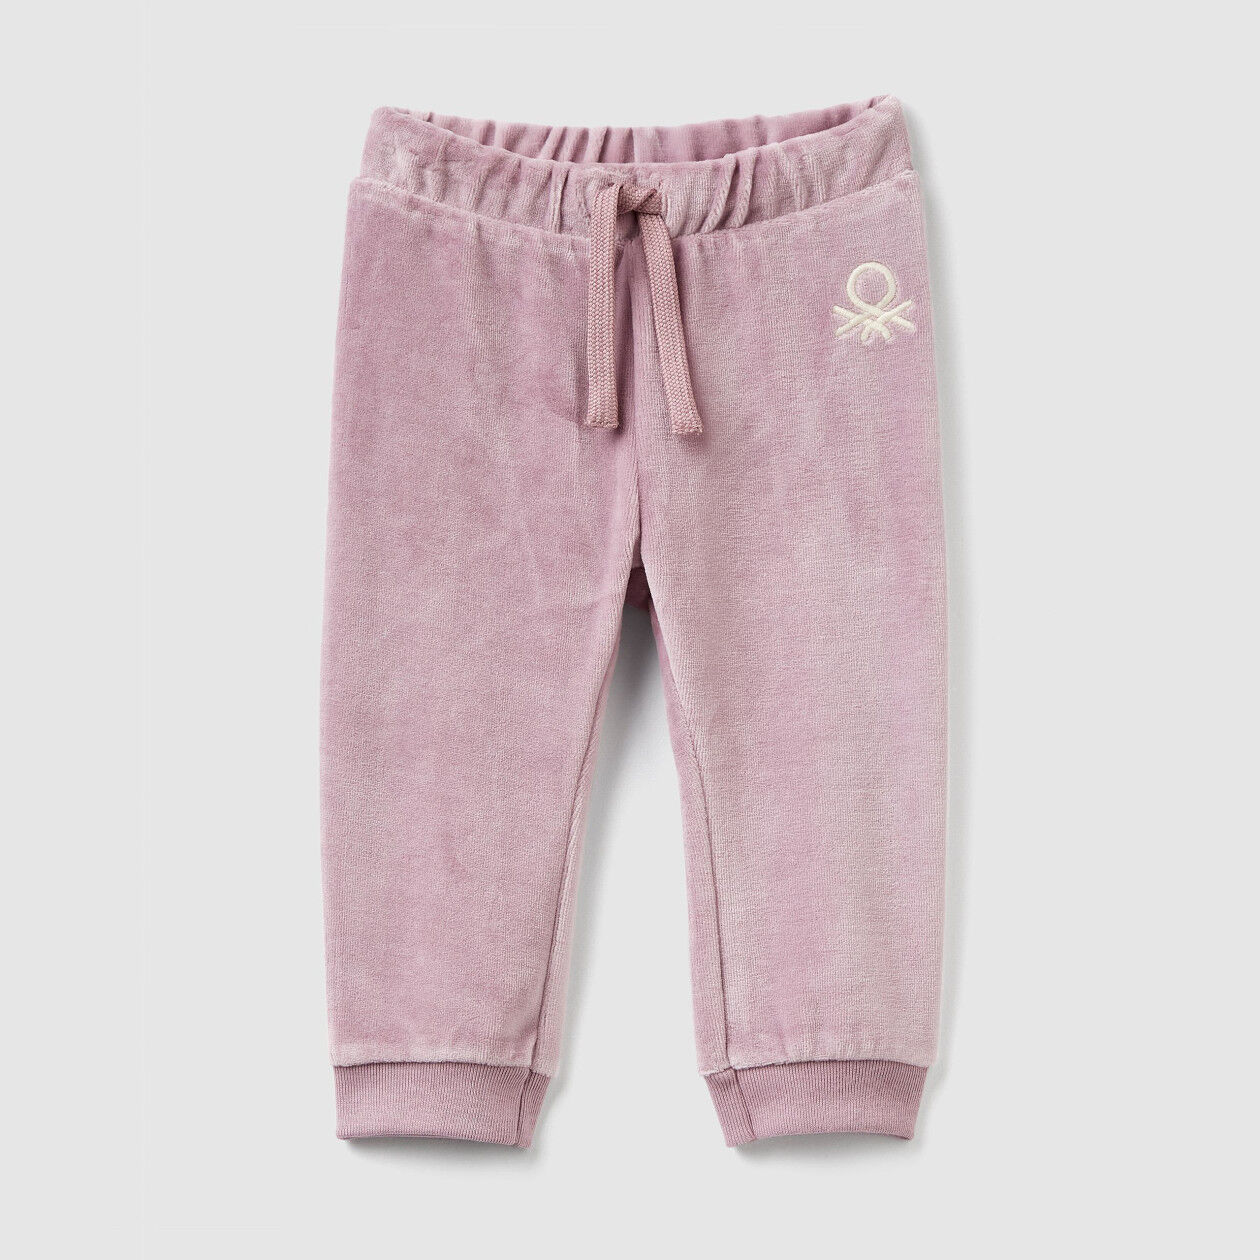 Pantalón de chenilla con cordón de ajuste